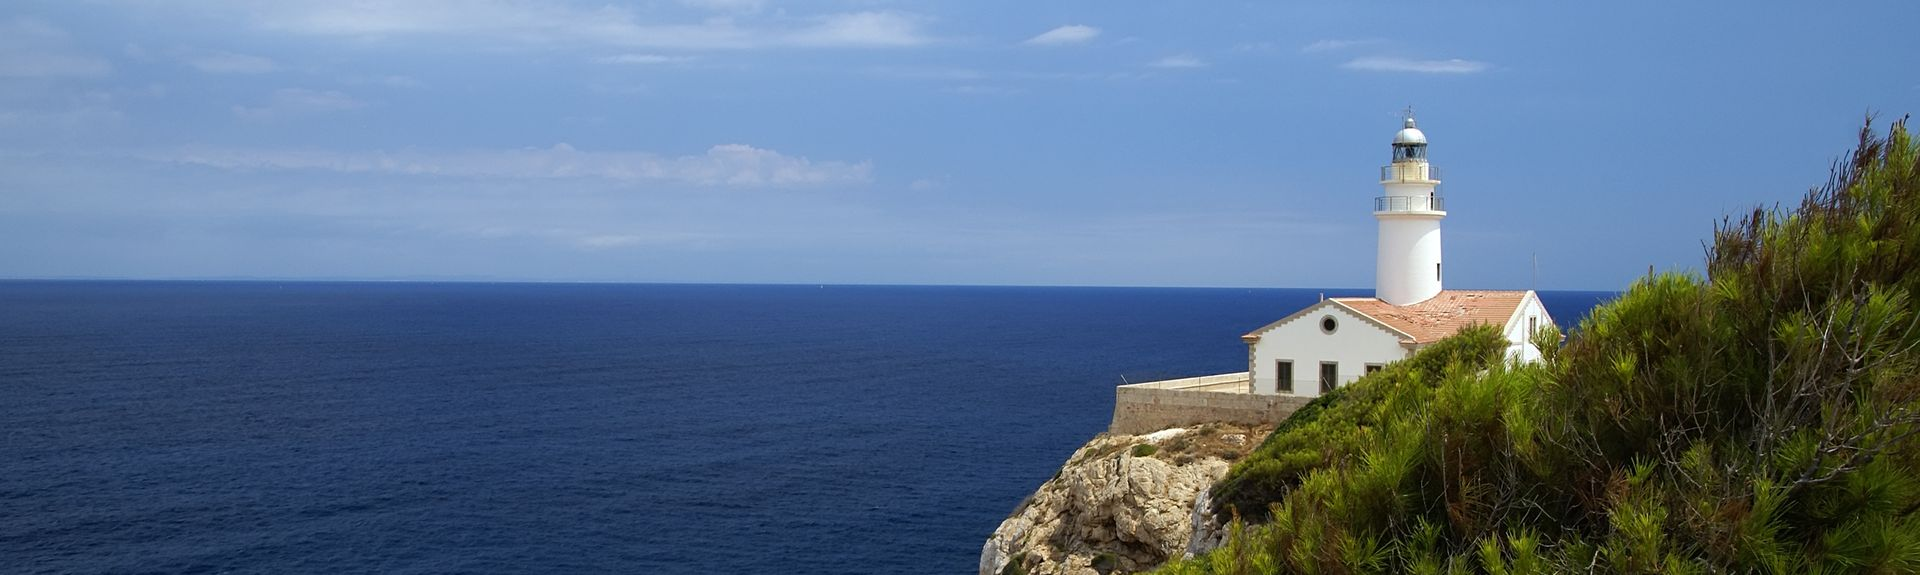 Cala Ratjada, Isole Baleari, Spagna